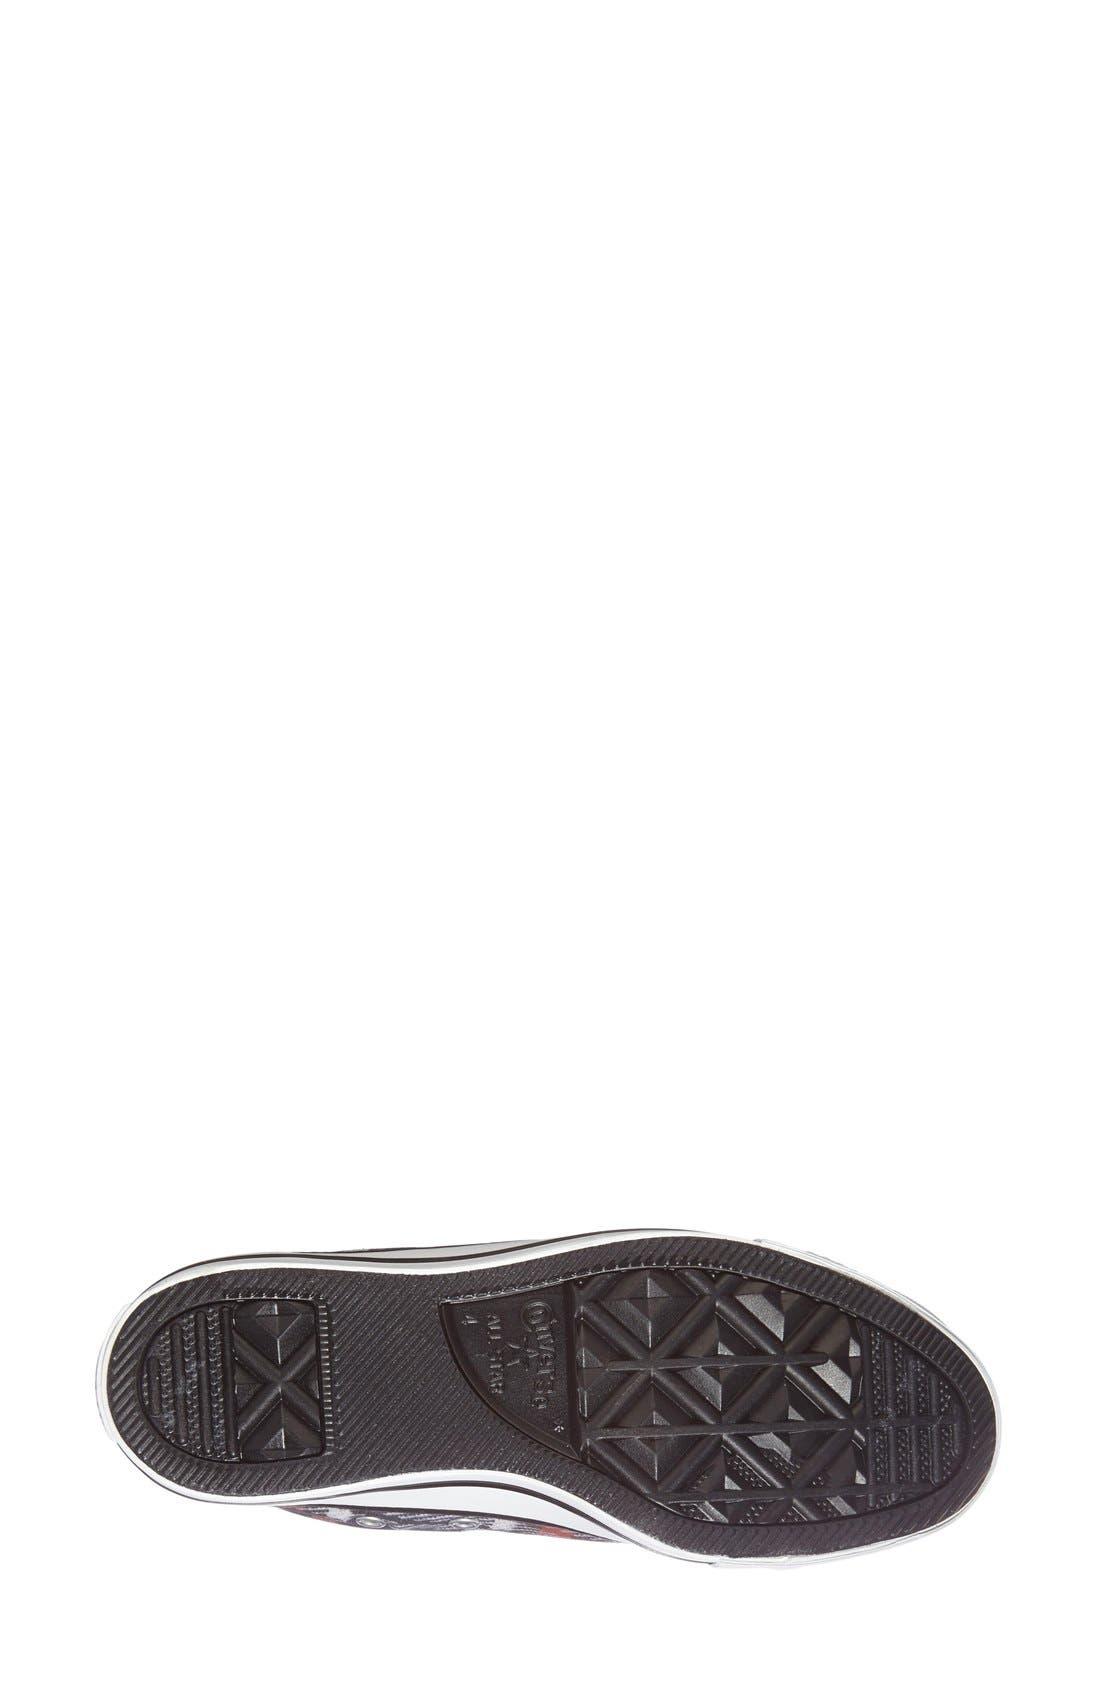 Alternate Image 4  - Converse Chuck Taylor® All Star® Plaid High Top Sneaker (Women)